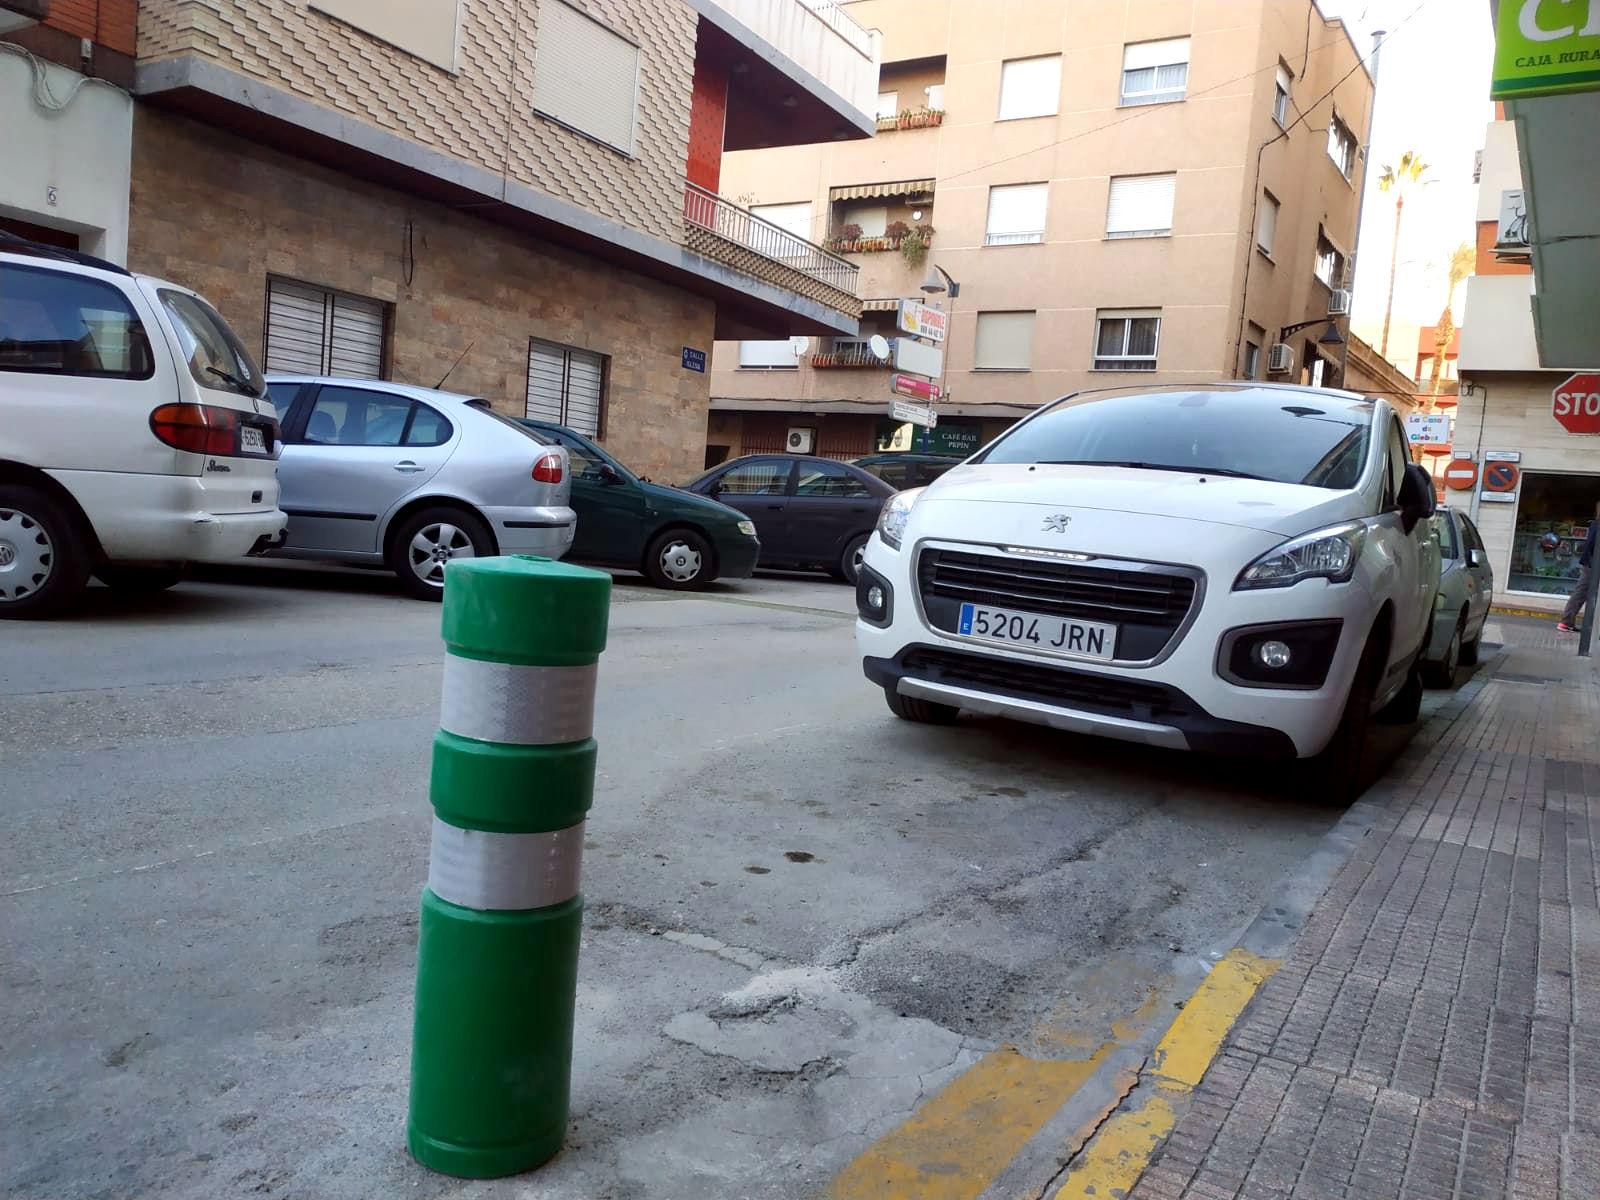 20190111.- Bolardo derribado calle Iglesia arregaldo